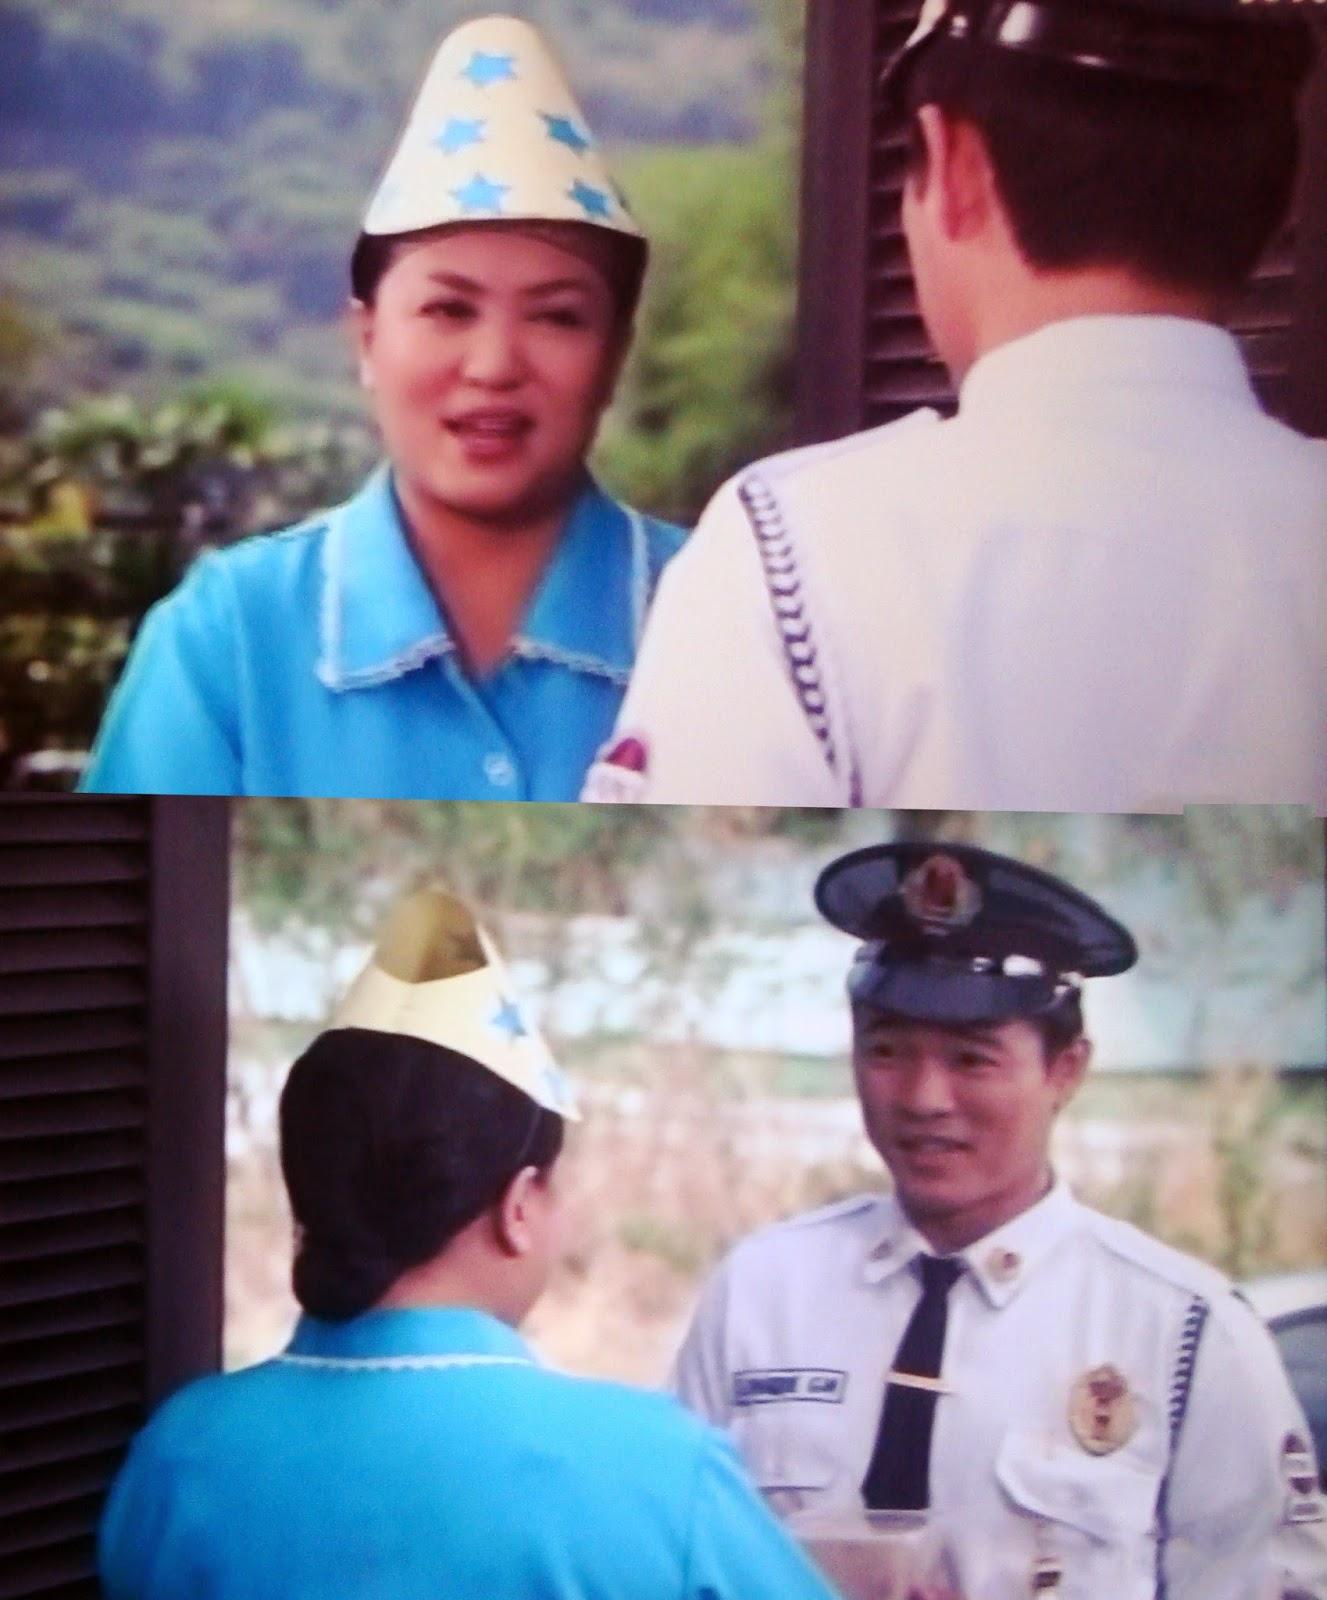 Sabel to Manong Guard